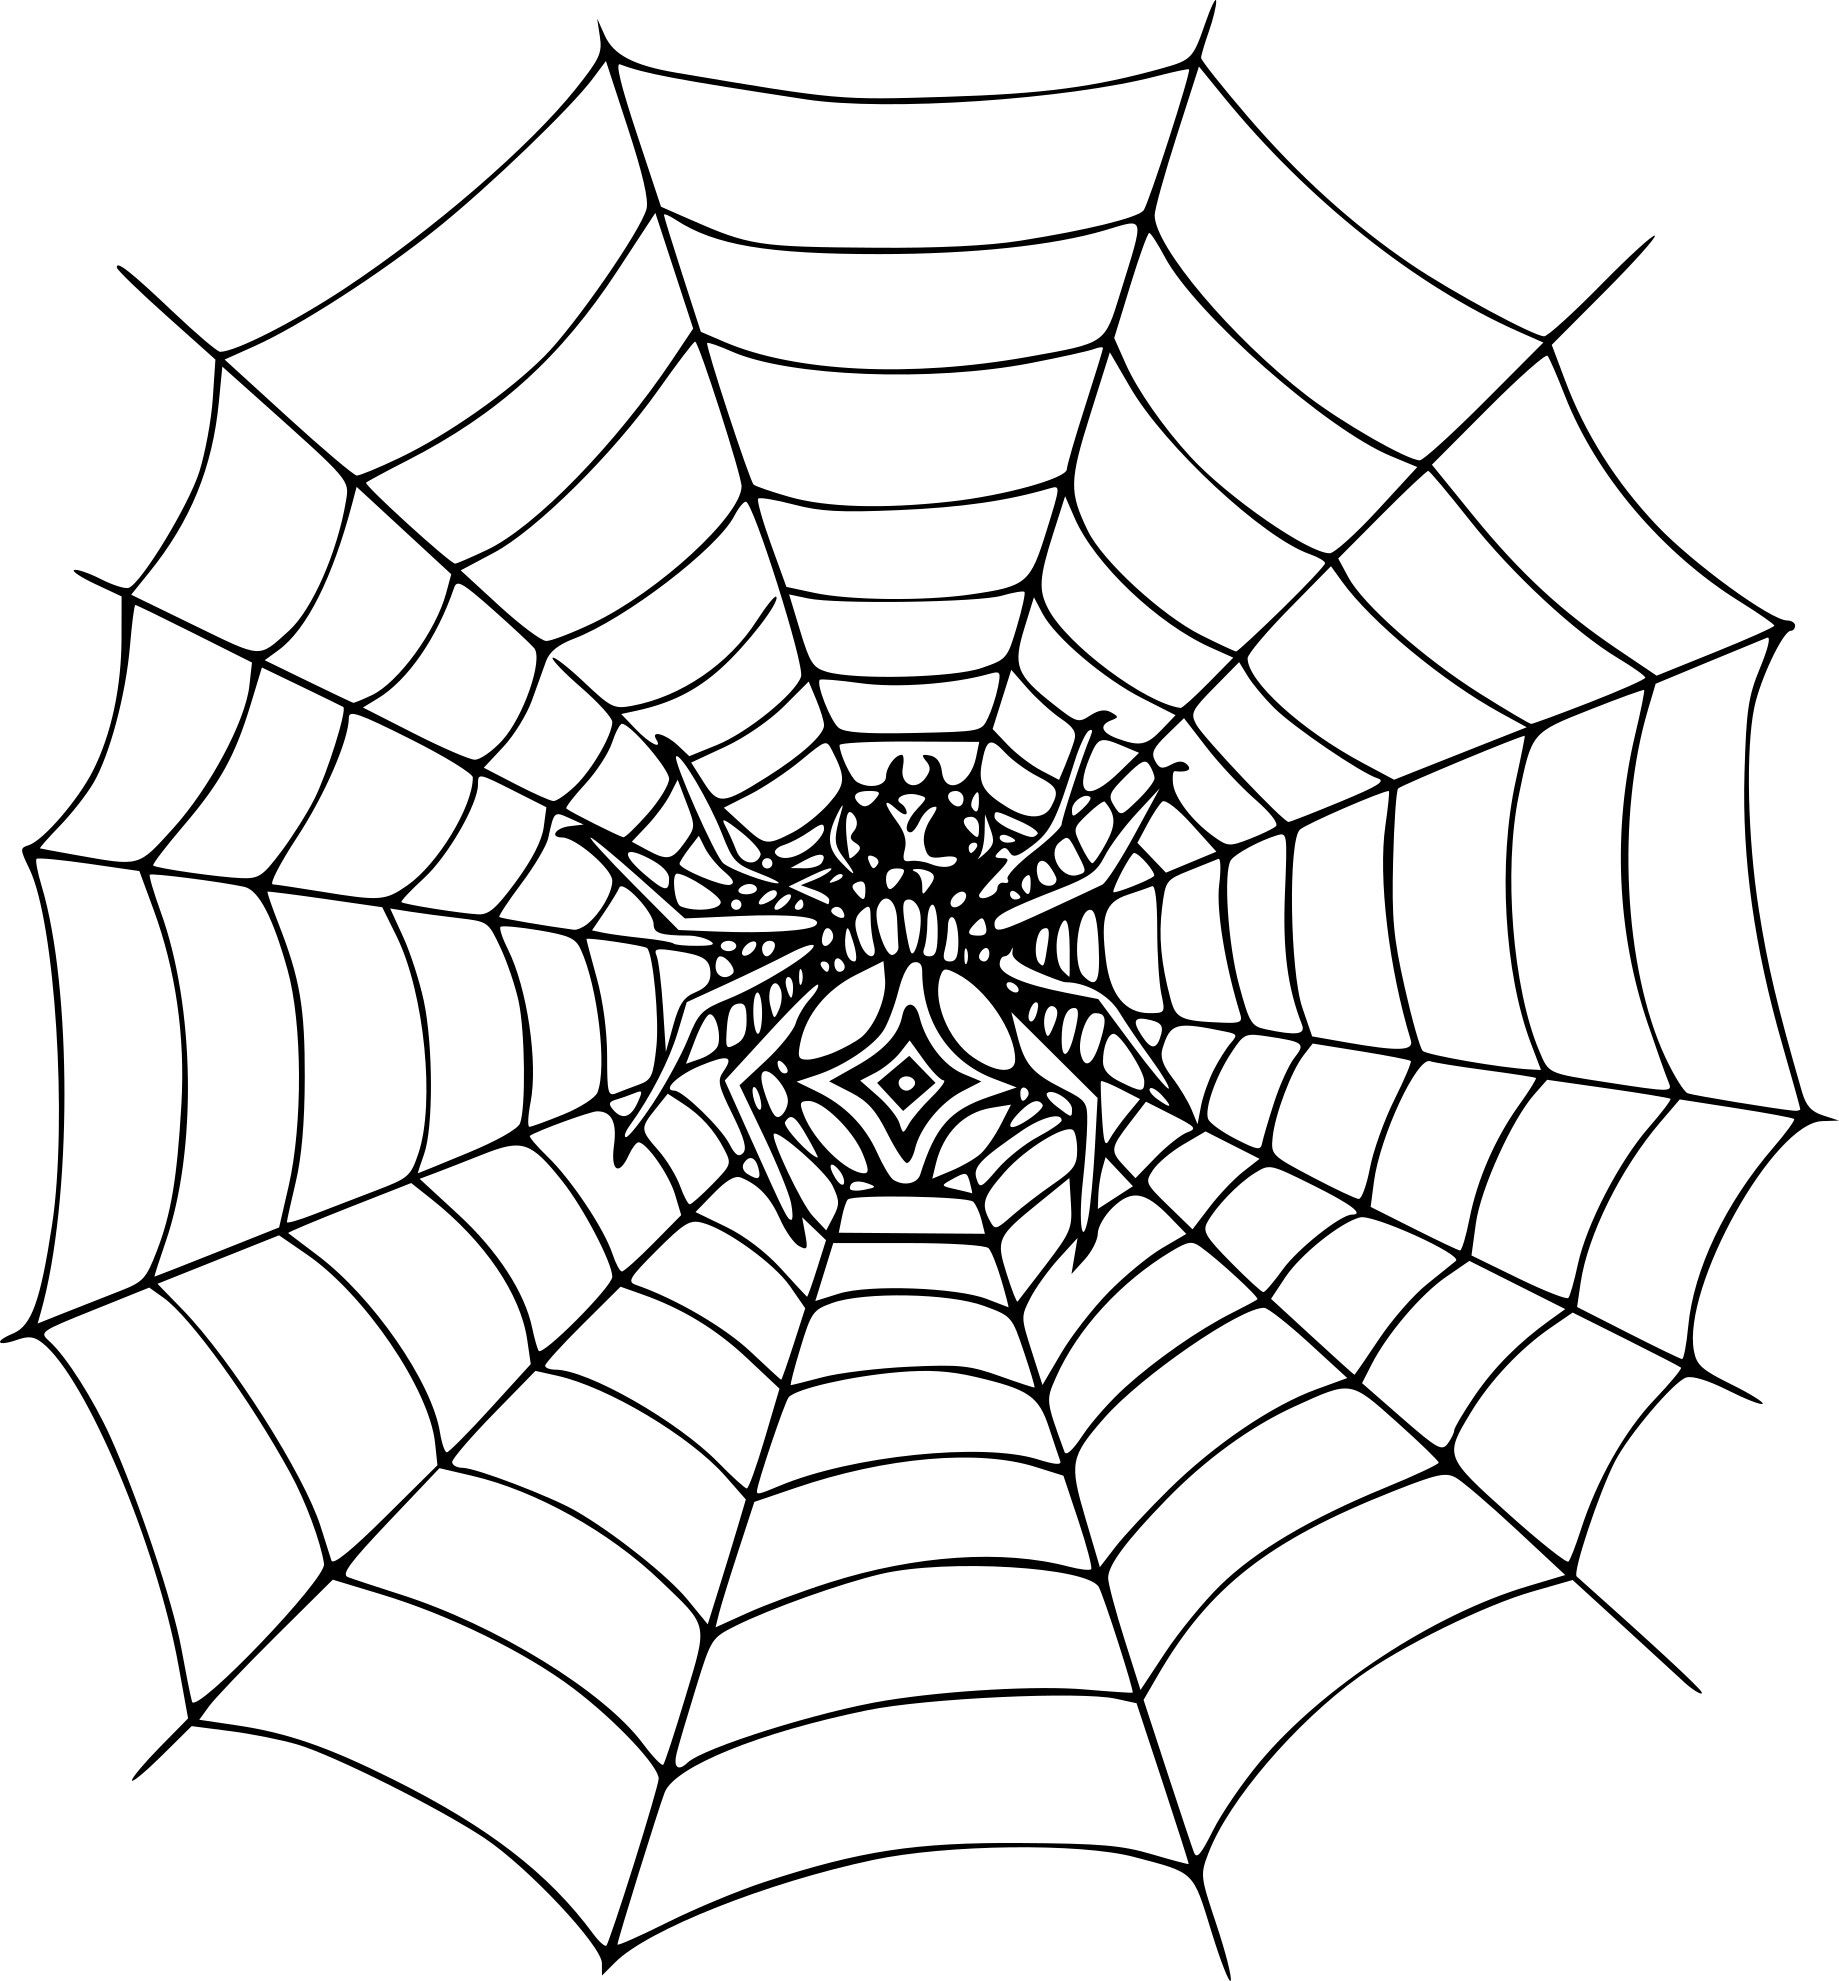 Coloriage Araignée Toile Dessin À Imprimer Sur Coloriages tout Dessin Toile Araignée